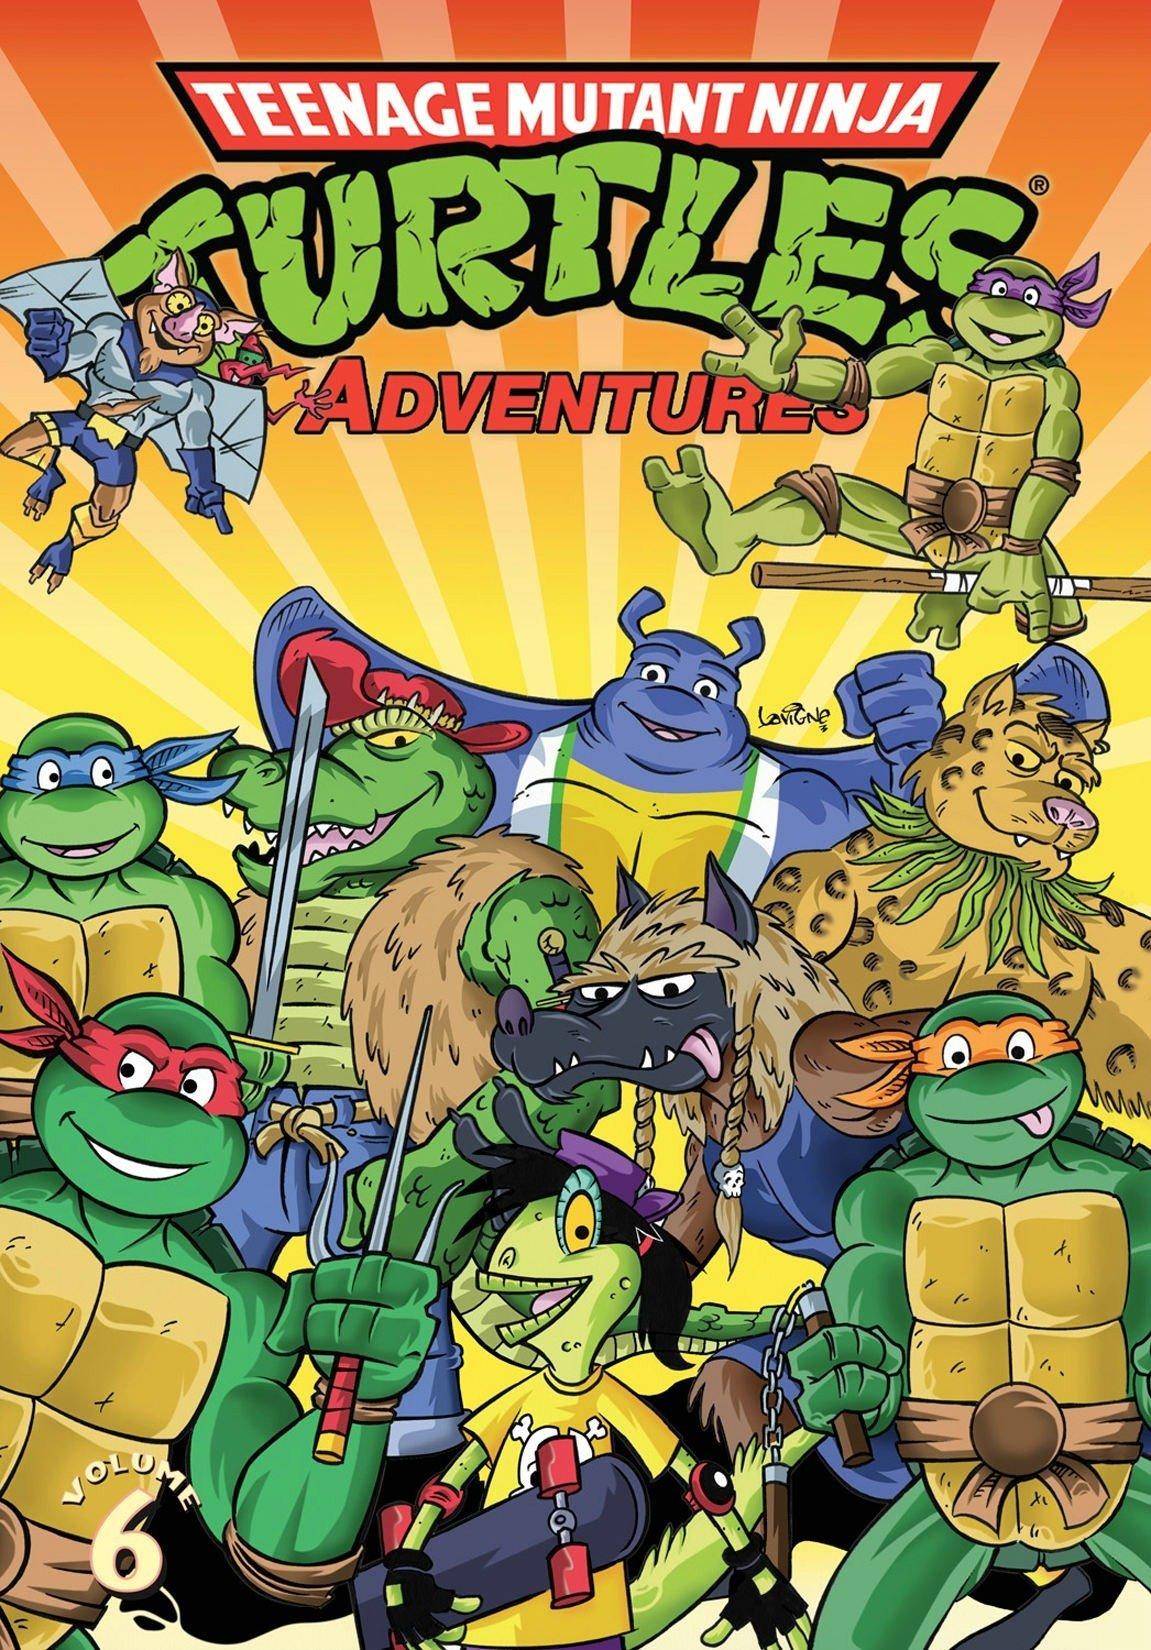 Download Teenage Mutant Ninja Turtles Adventures Volume 6 (TMNT Adventures) ebook